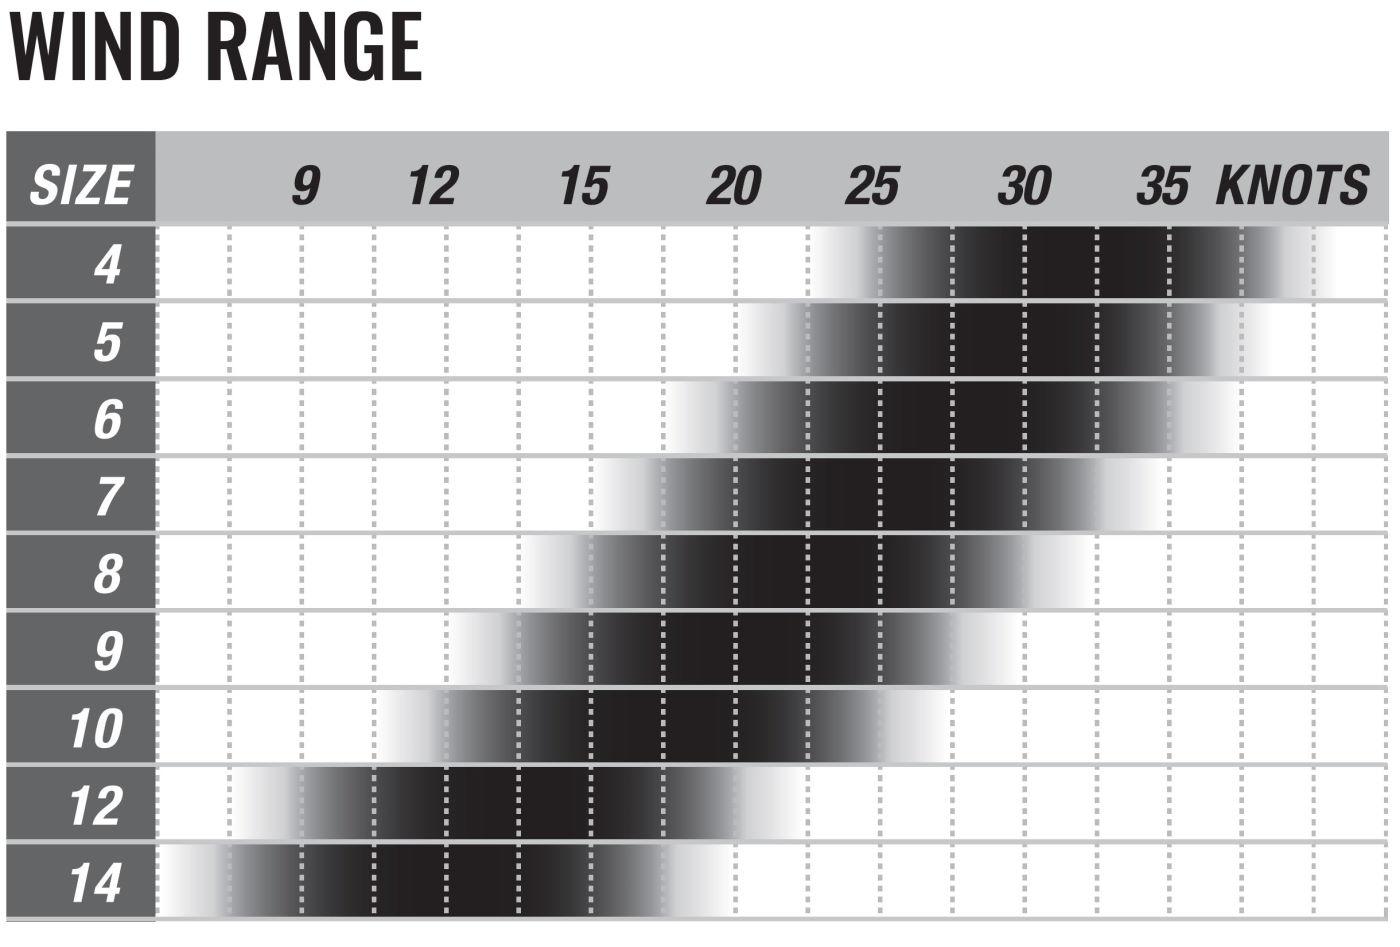 2020 Cabrinha Moto Kite wind range chart